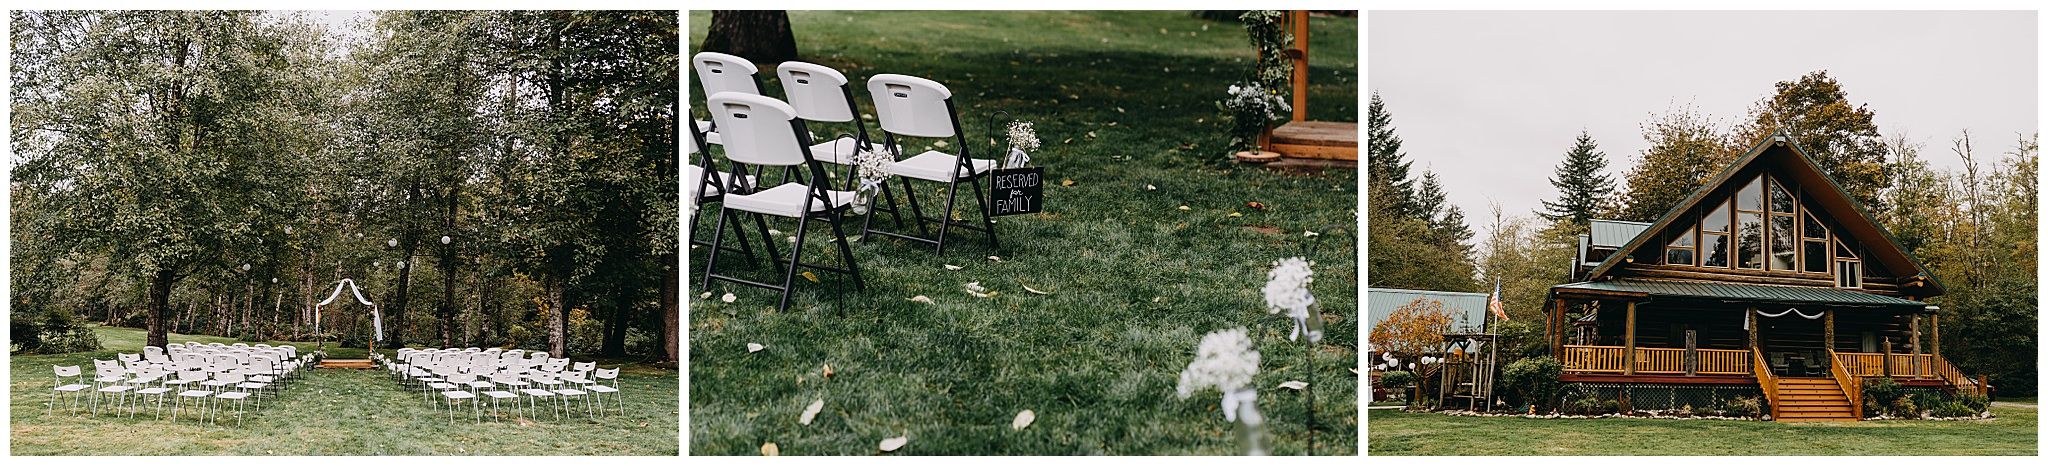 wallace-falls-lodge-wedding-evan-kelsey11.jpg